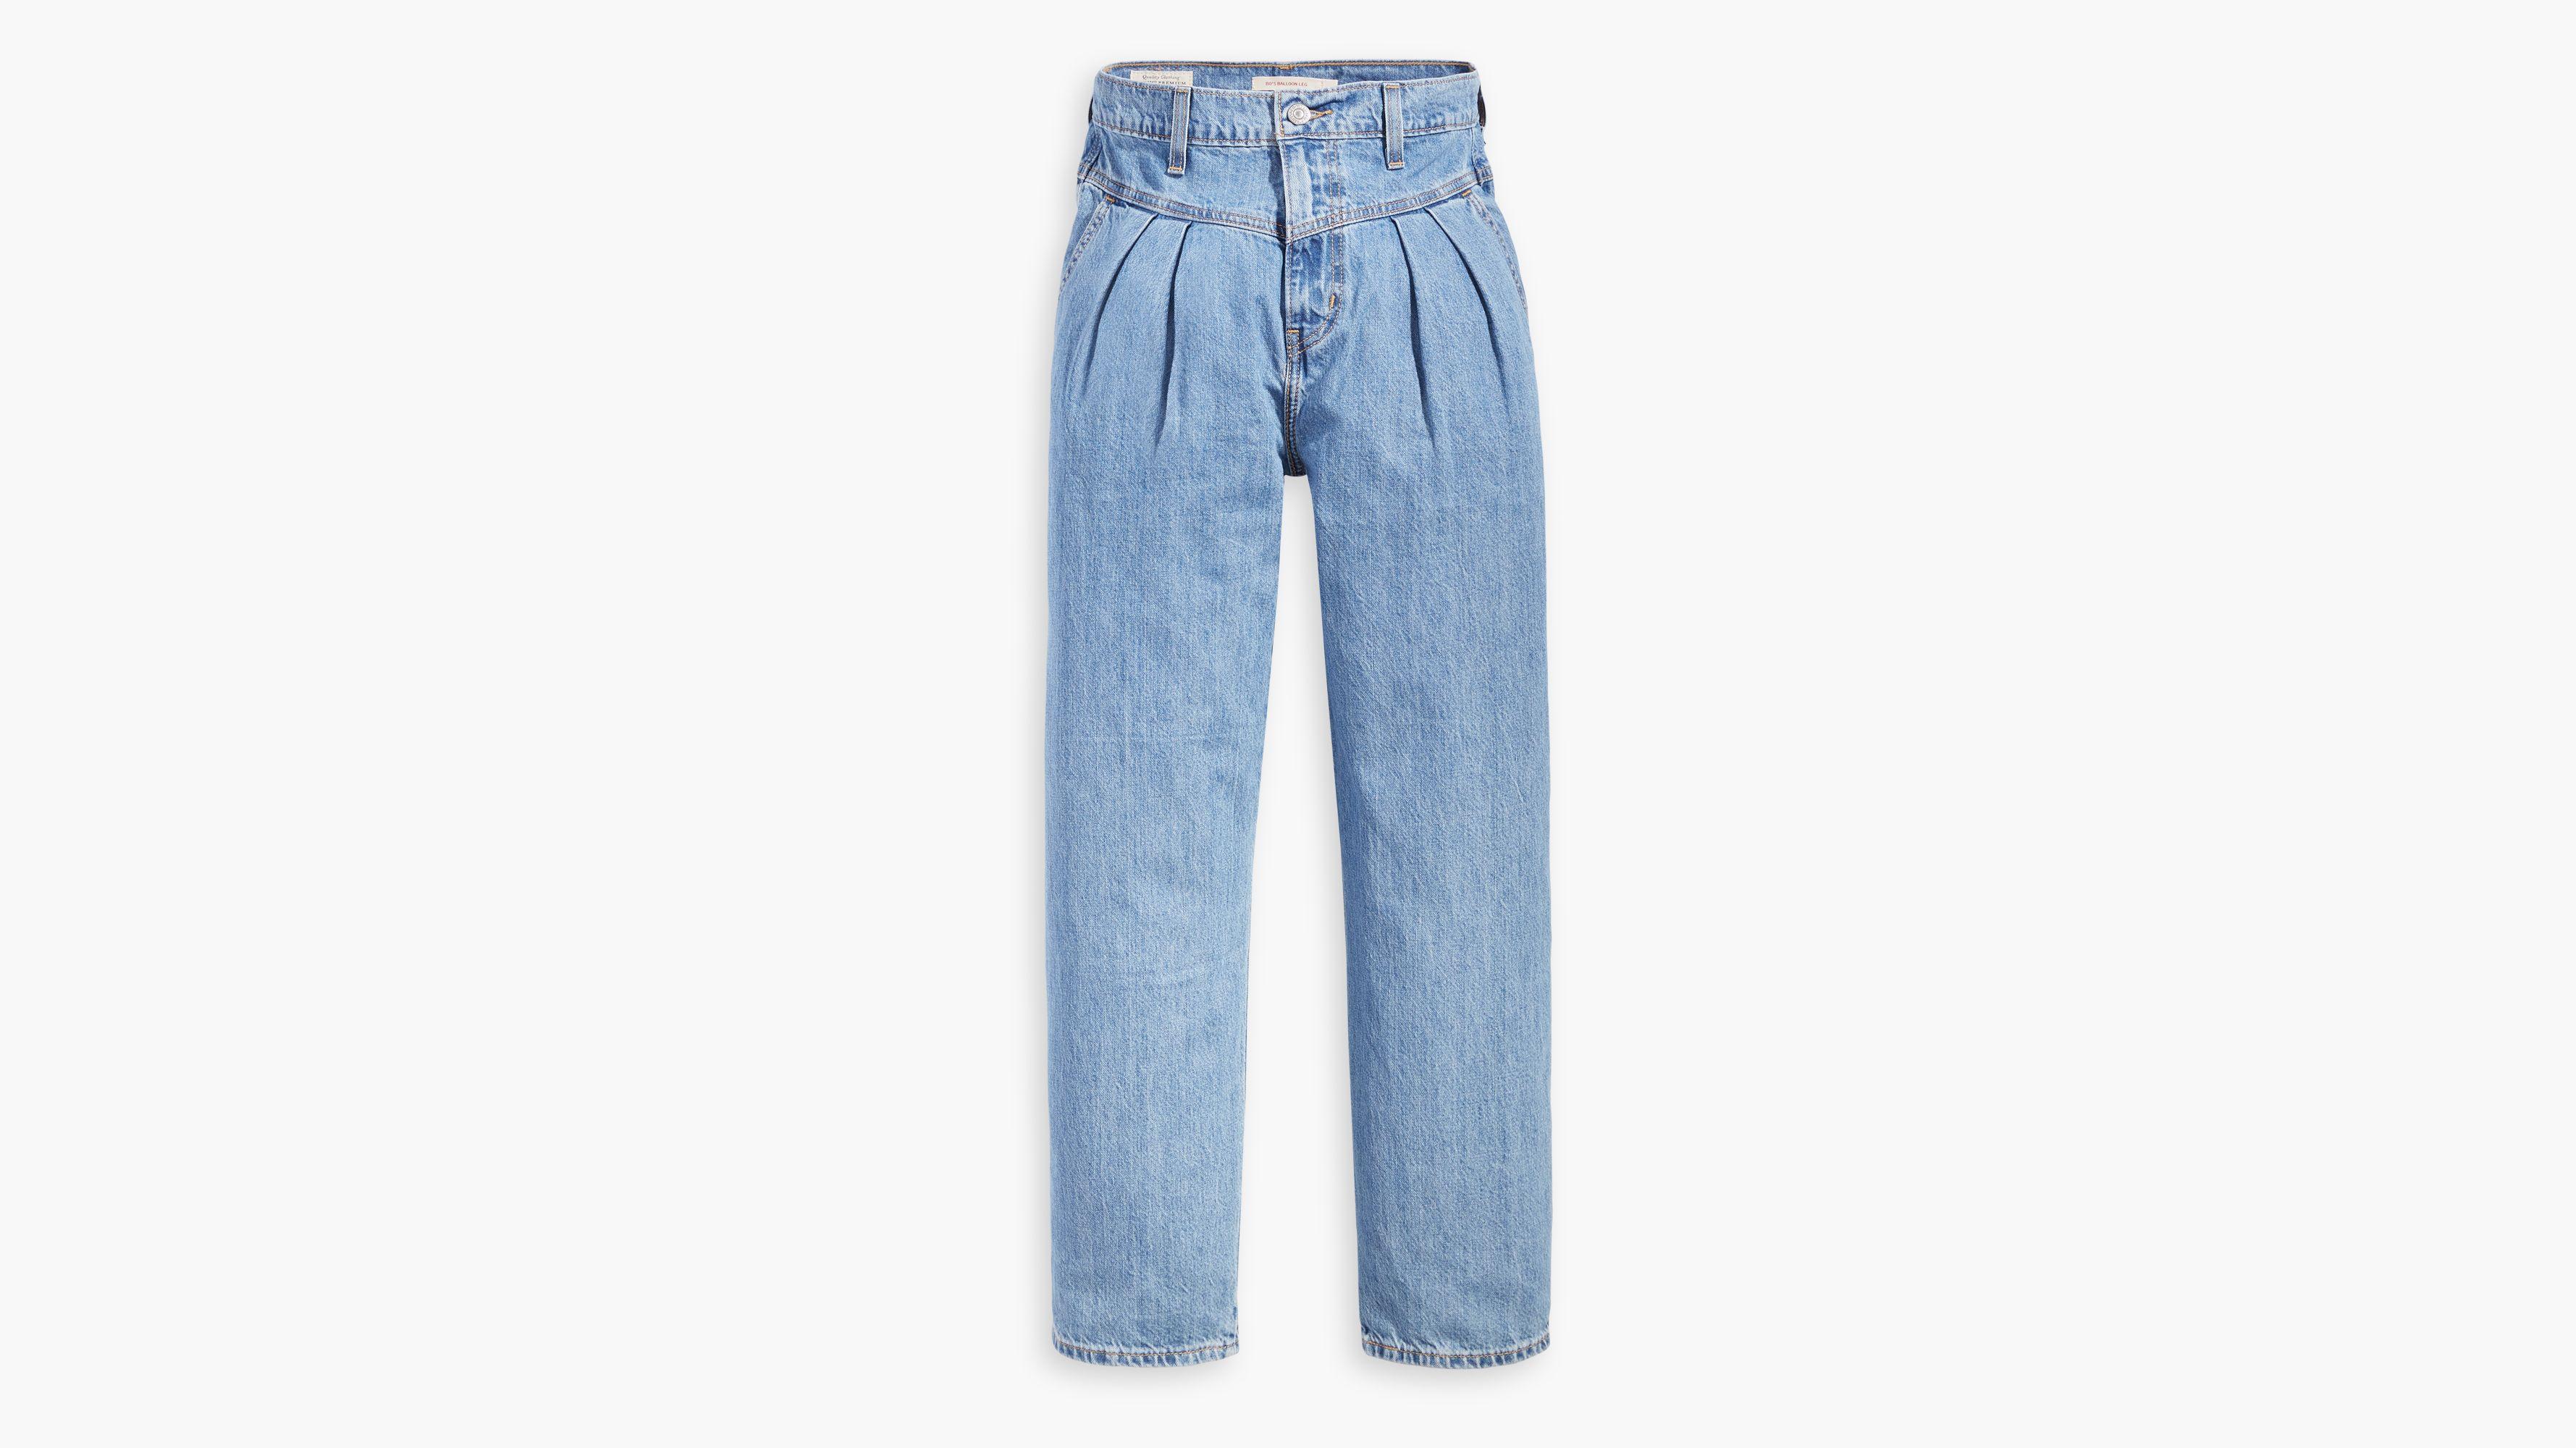 80s levis jeans | Etsy